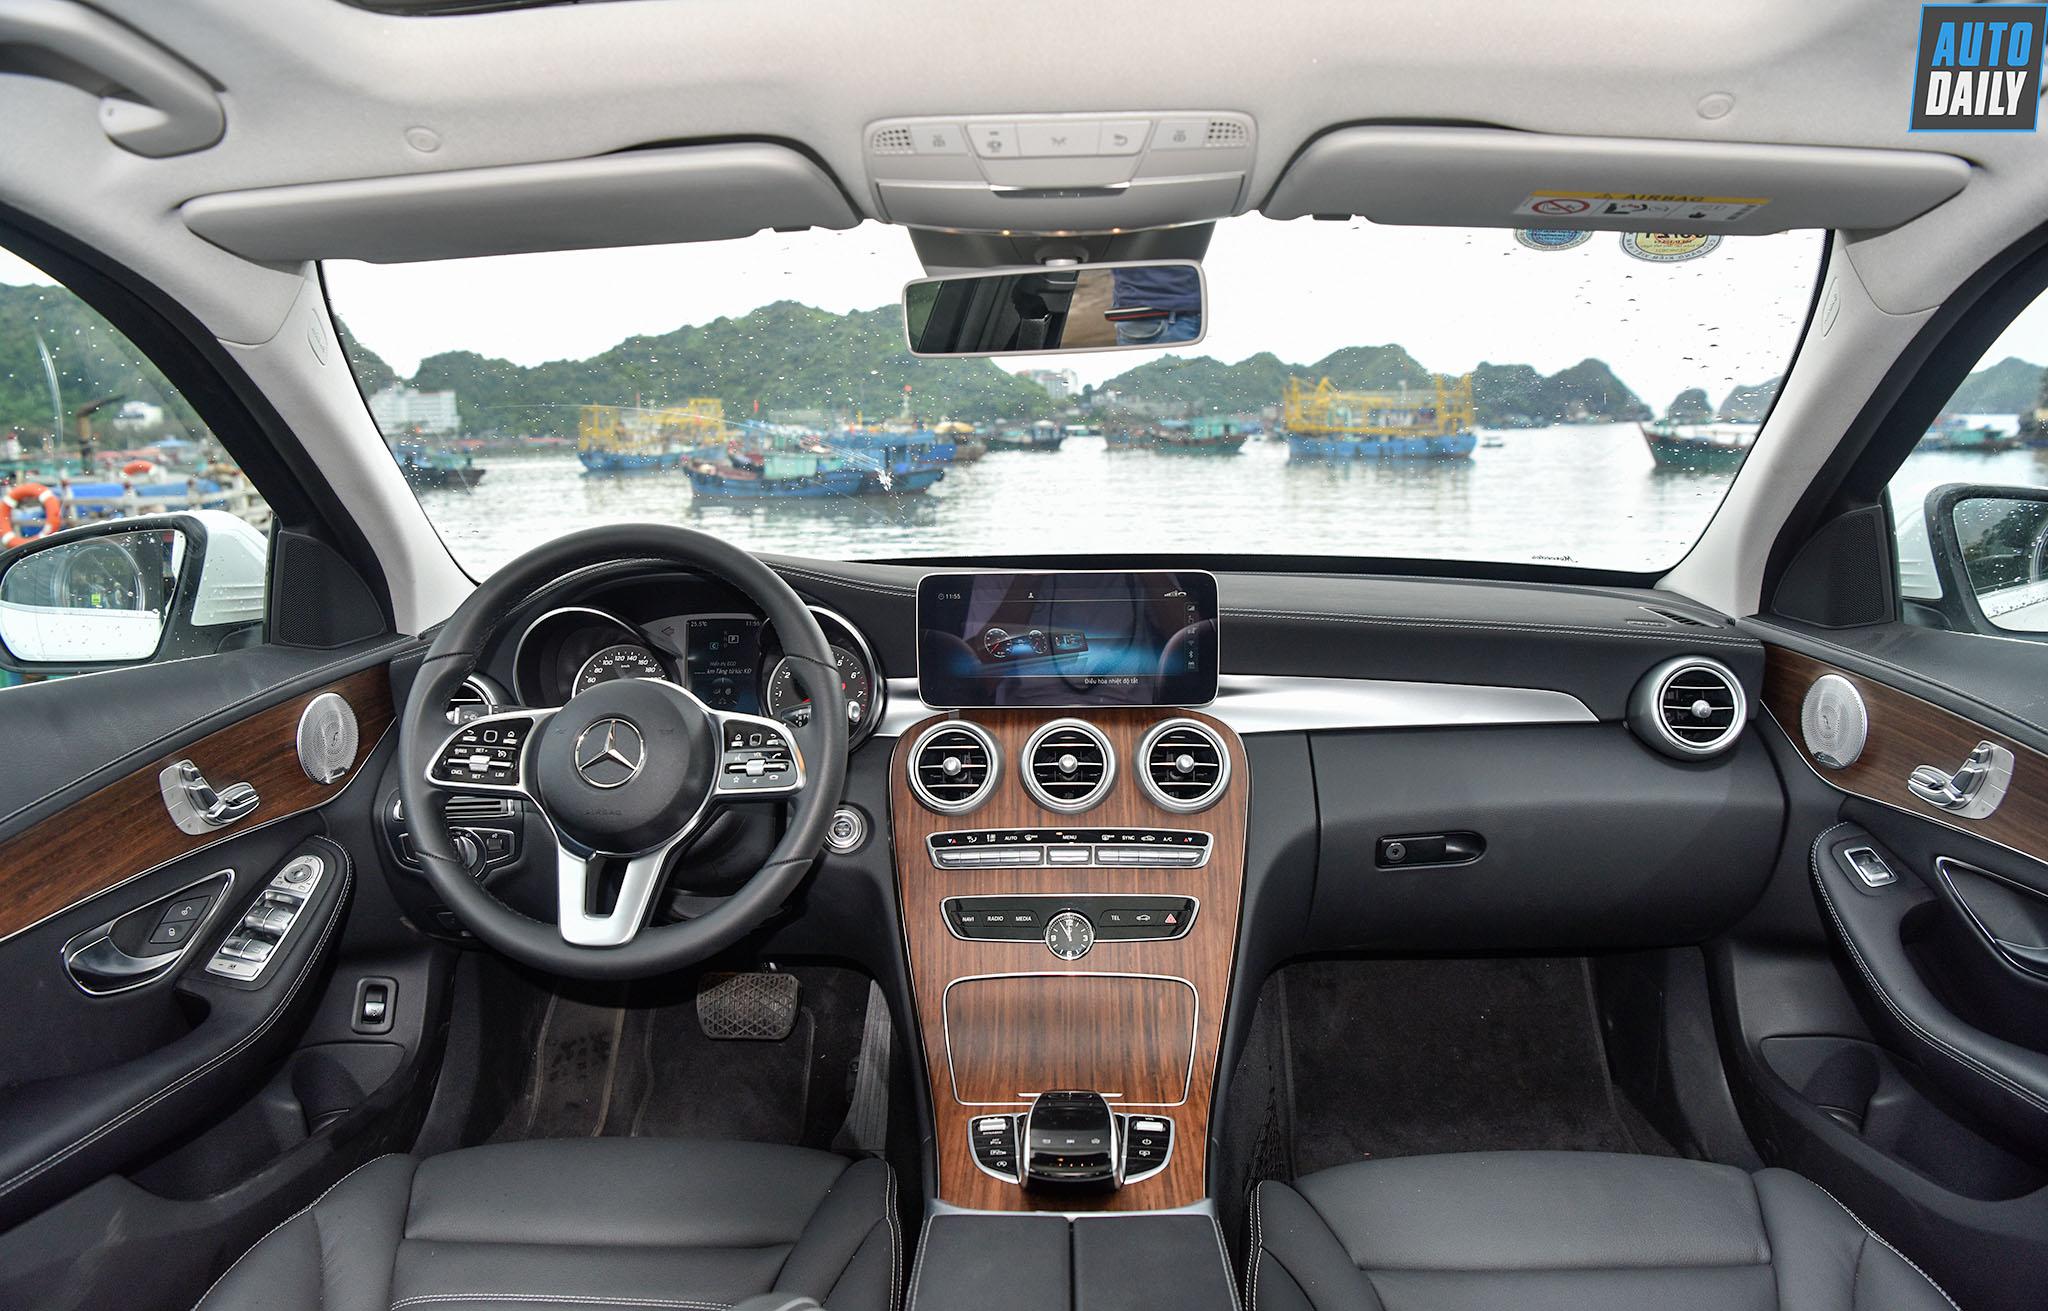 mercedes-c200-exclusive-autodaily-mer54.jpg